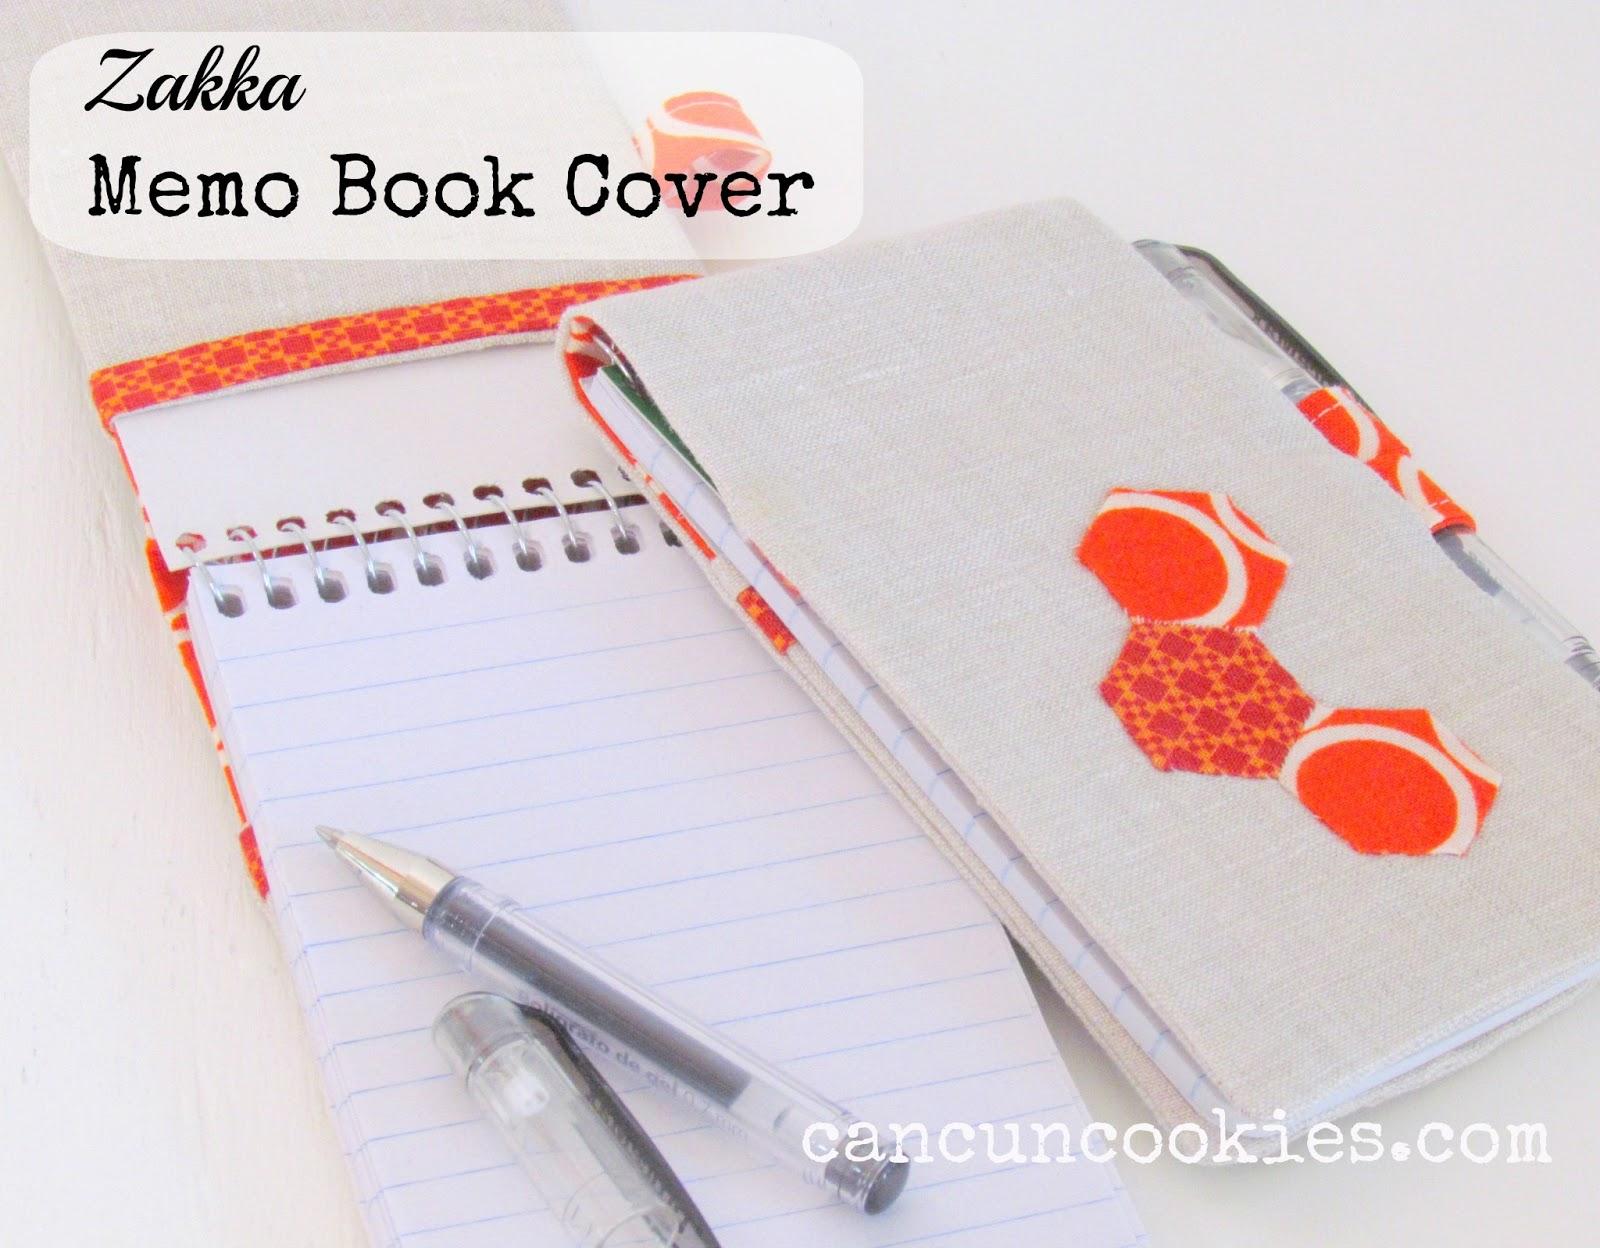 Book Cover Tutorial Java : Cancuncookies zakka memo book cover tutorial